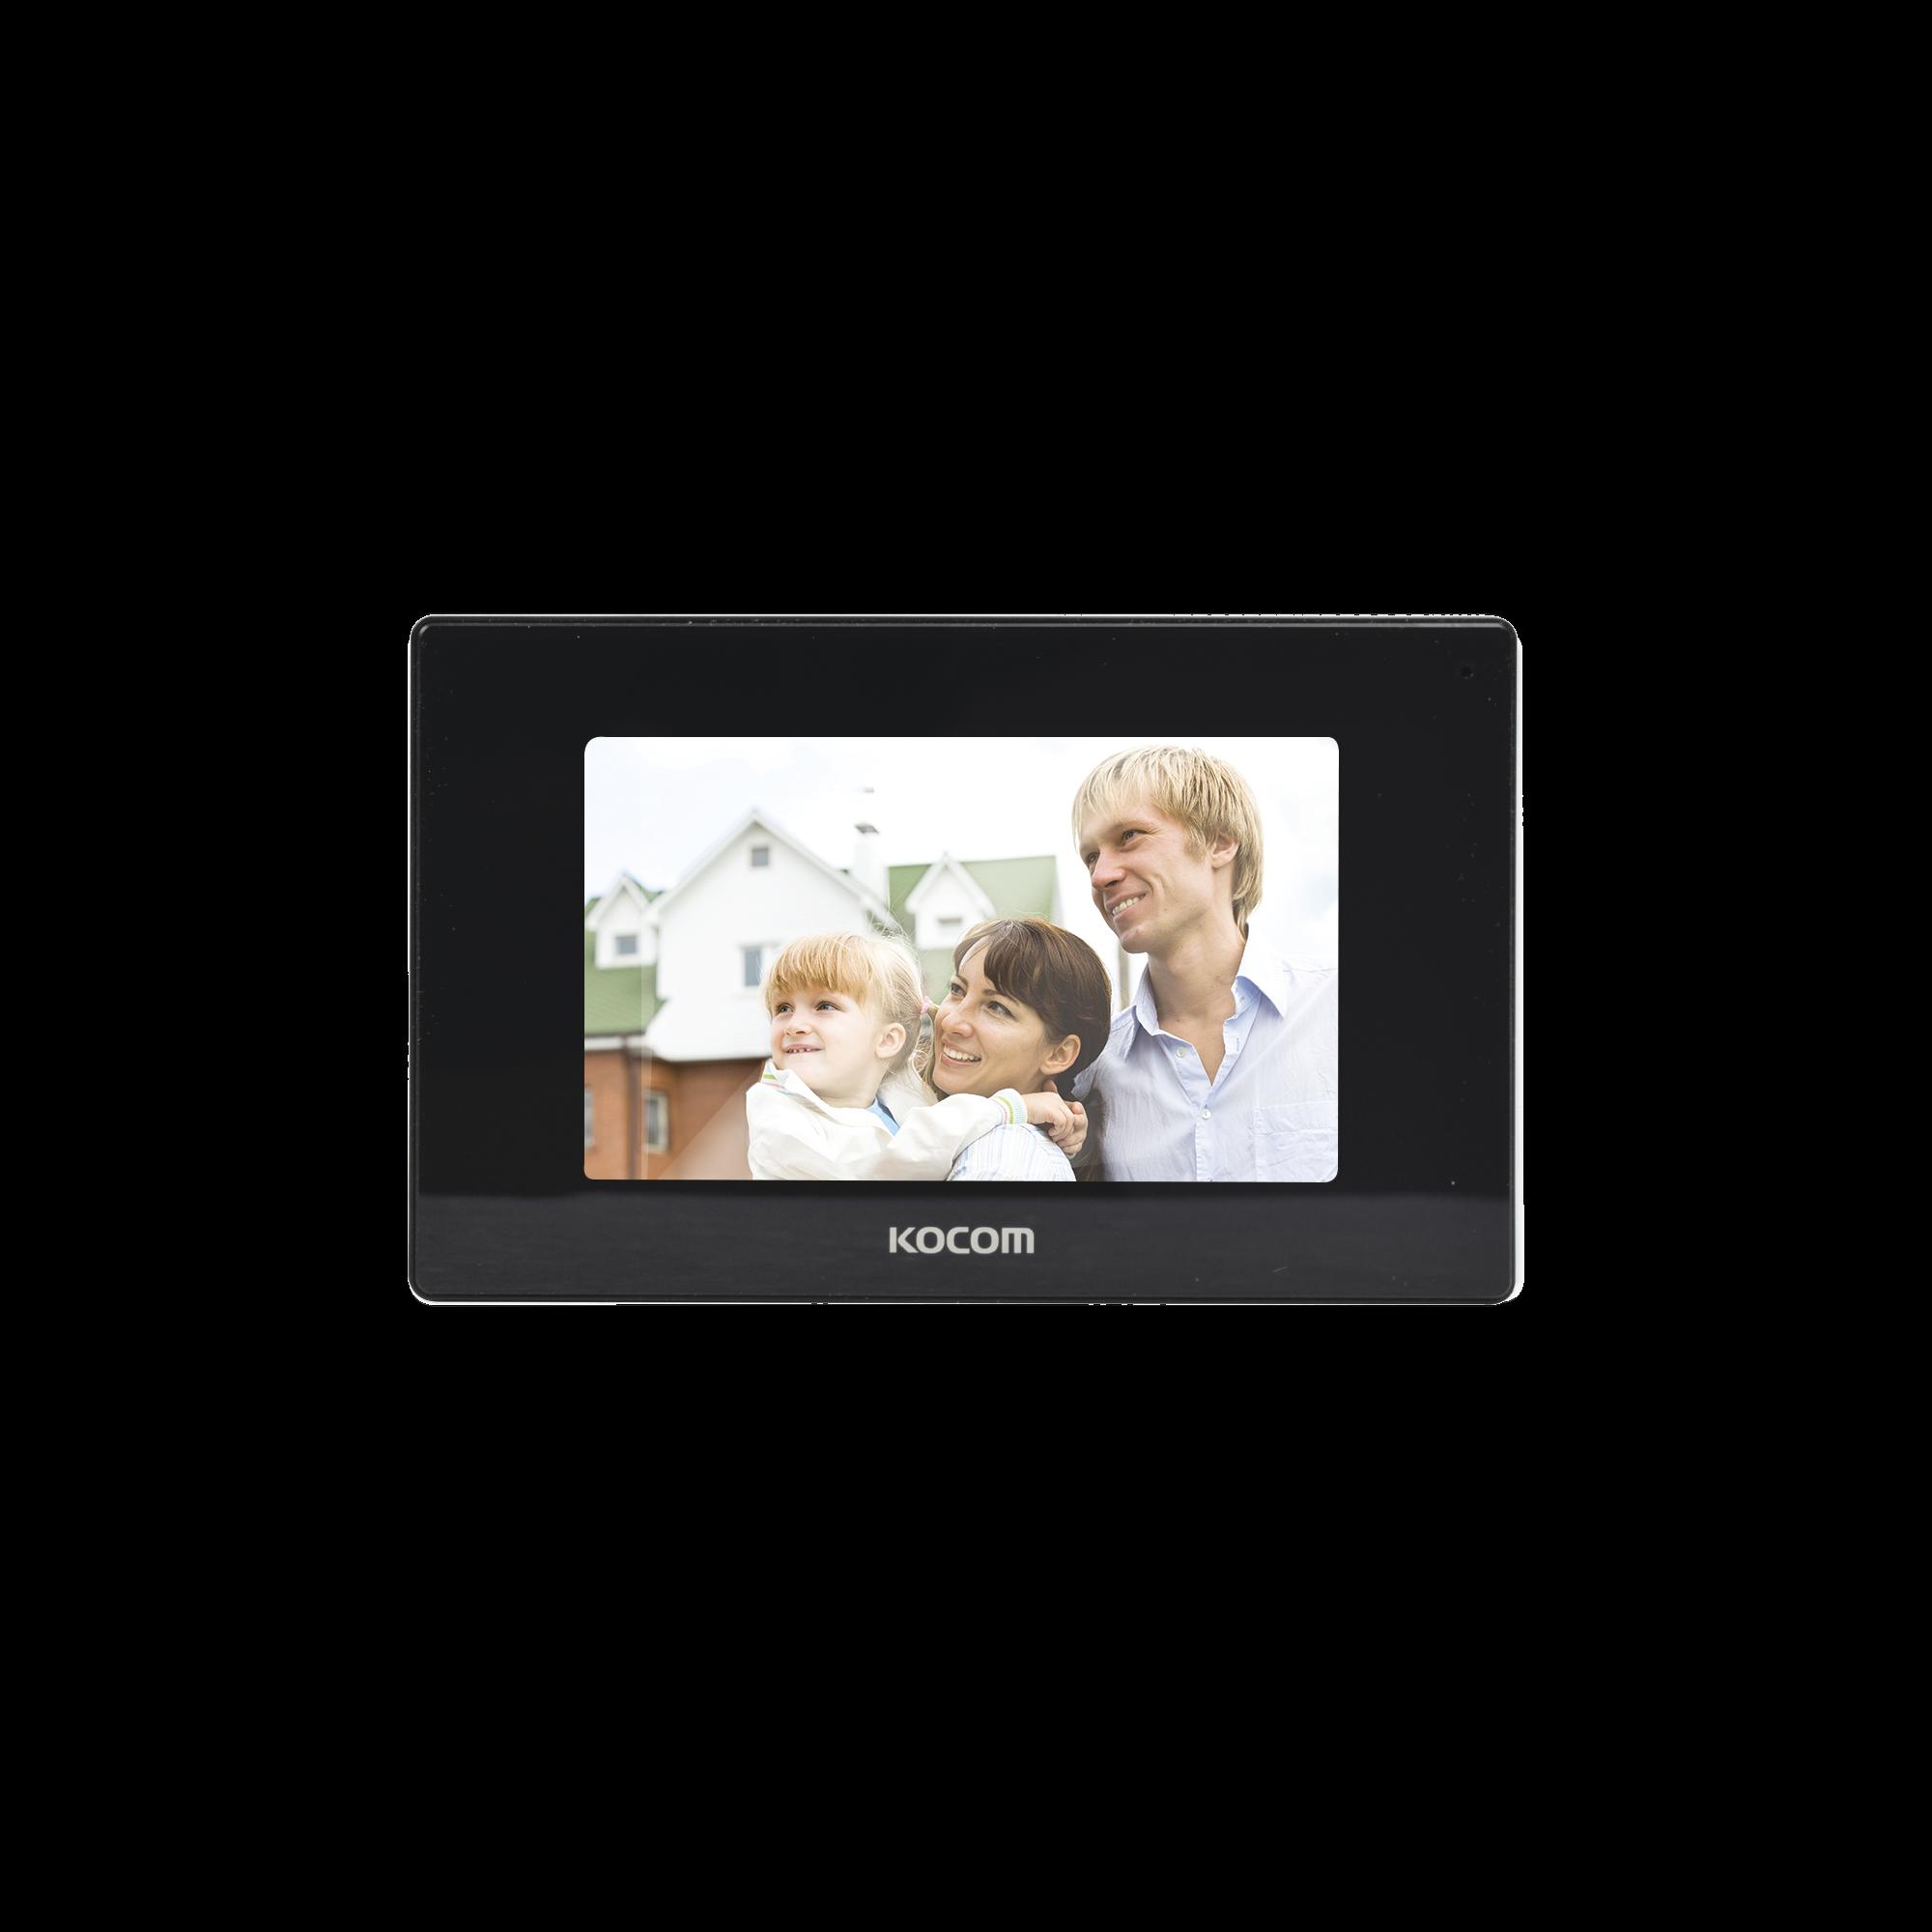 Monitor 7 color negro, alta definicion (HD), con entrada para microSD para grabacion